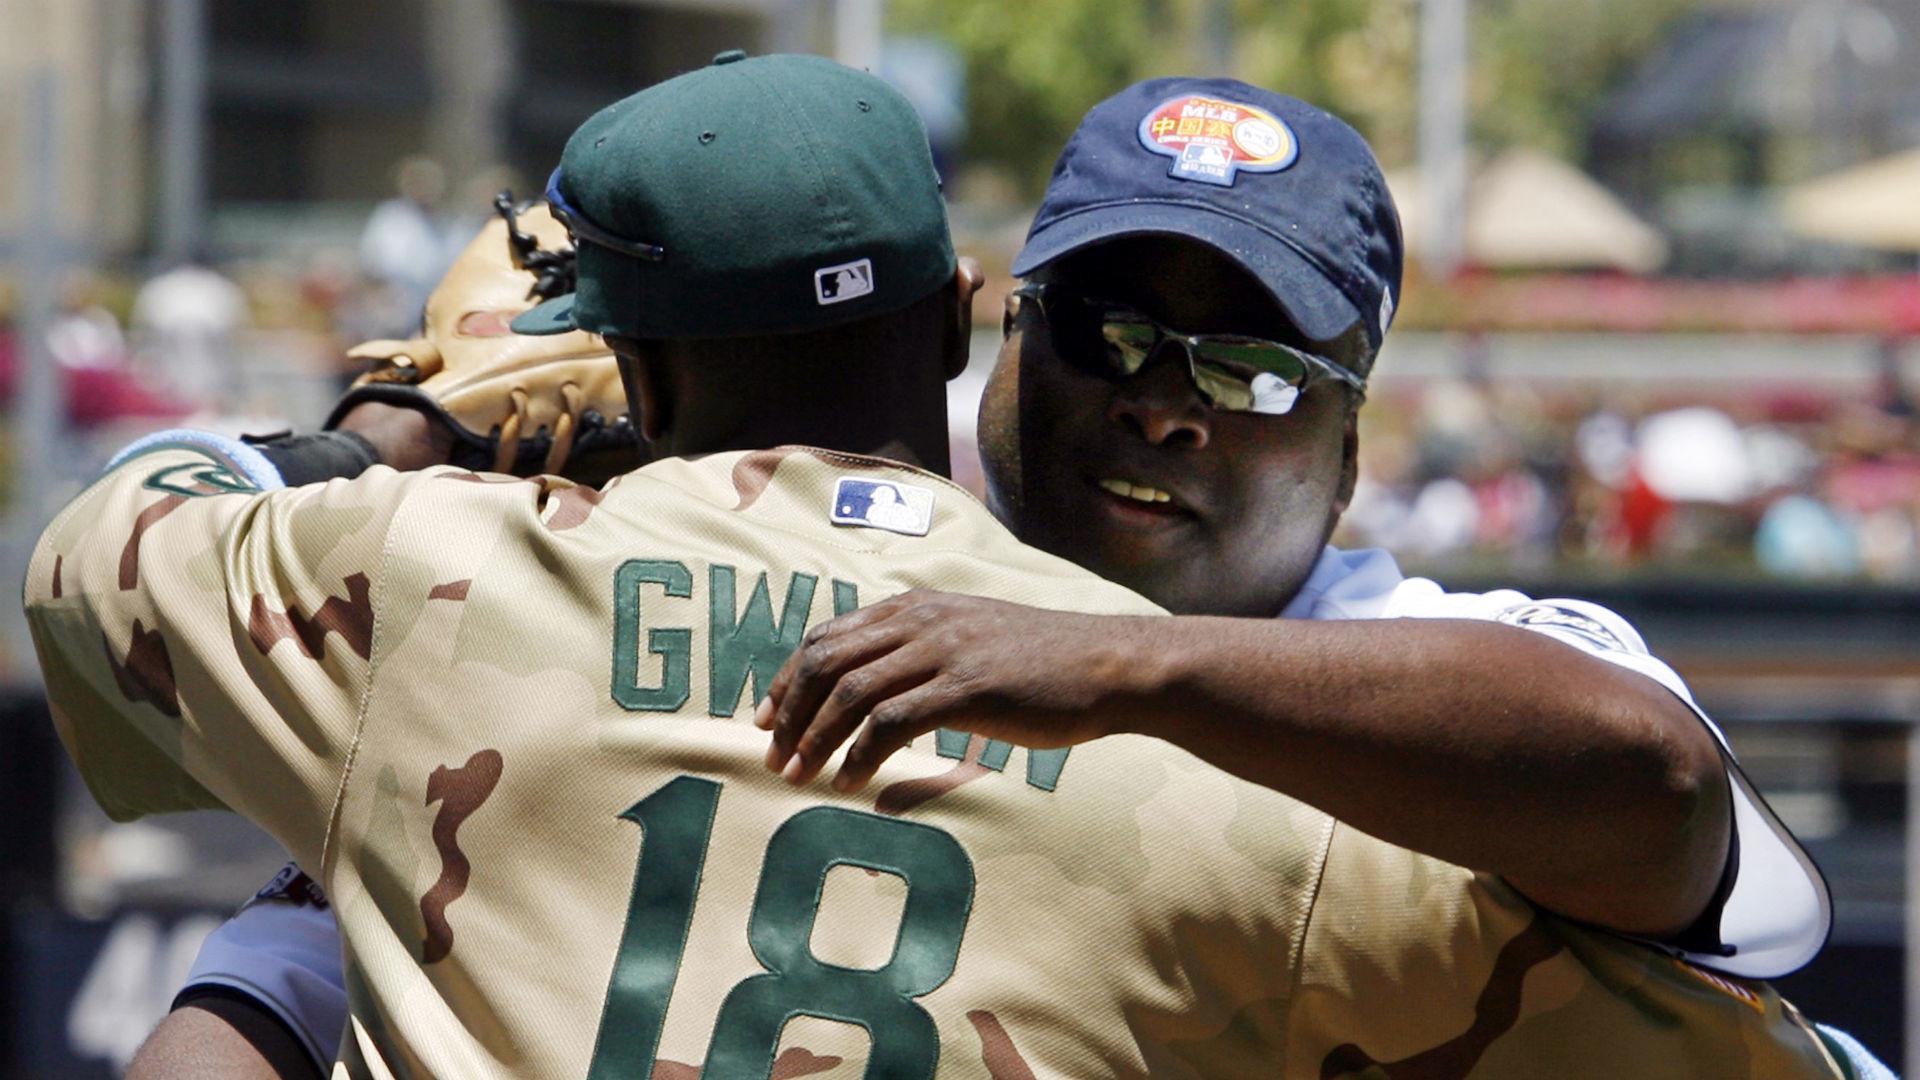 Baseball Legend Tony Gwynn Dies of Cancer He Blamed on Smokeless Tobacco